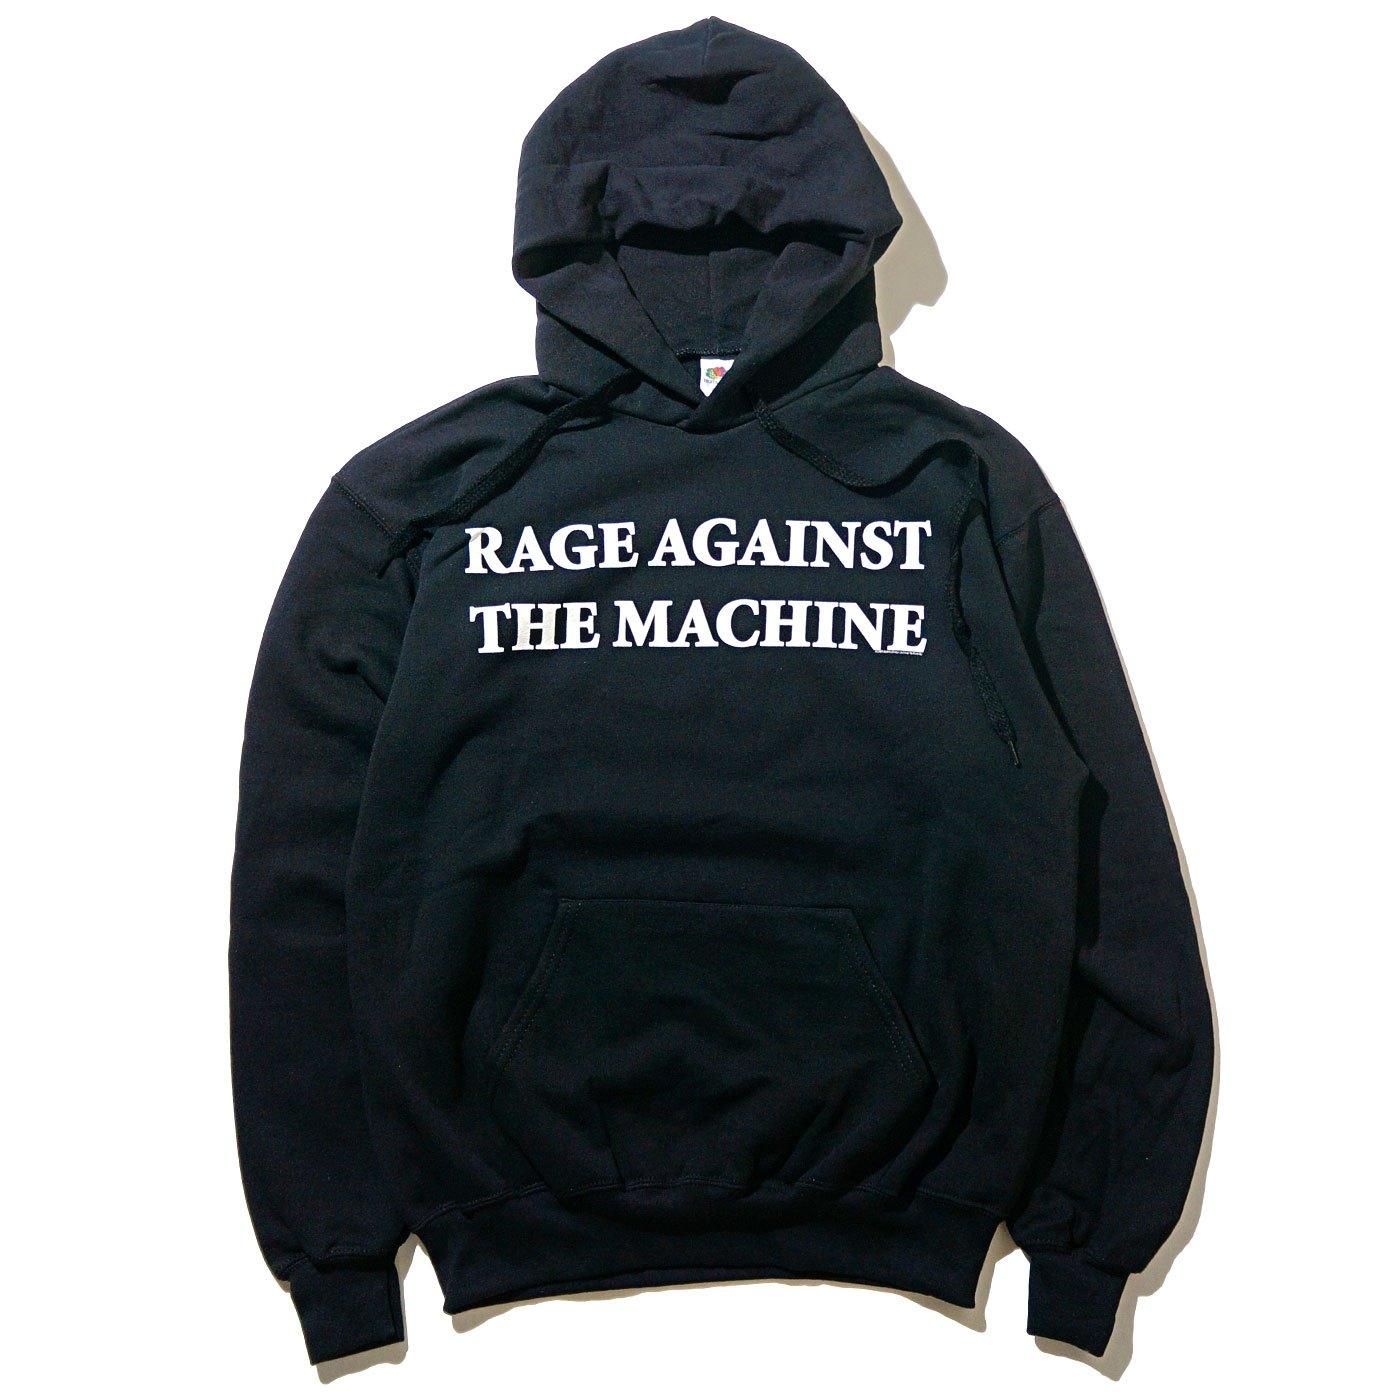 RAGE AGAINST THE MACHINE パーカー Burning Heart-Black